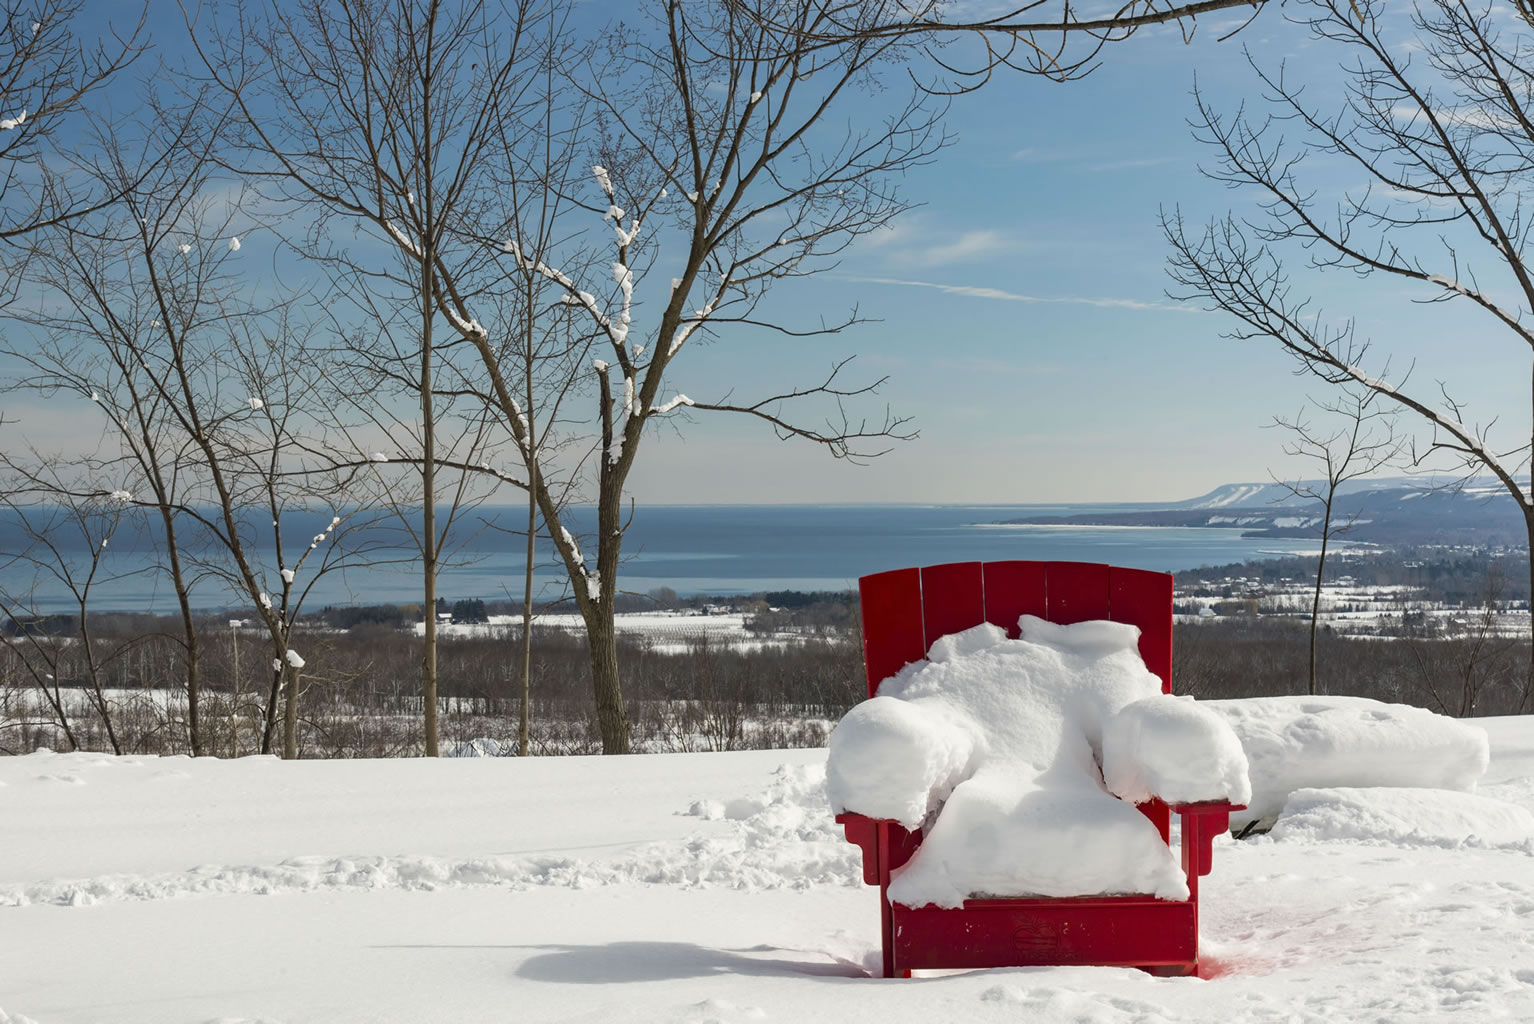 Irish Mountain Lookout in the winter